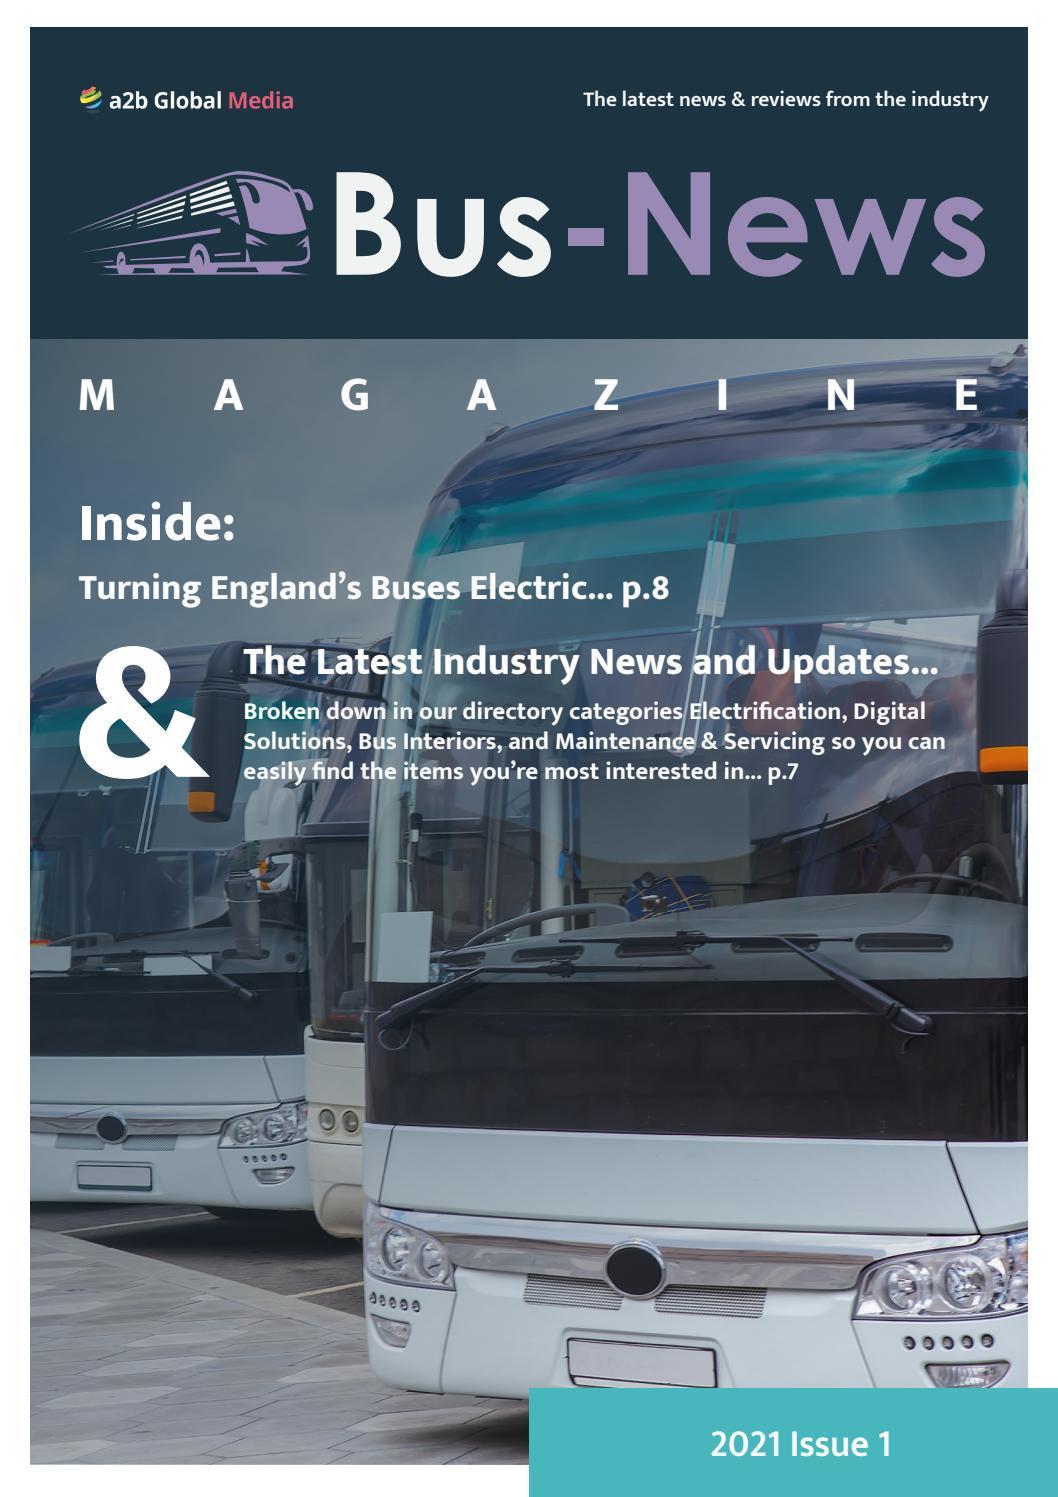 Bus-News Magazine Issue 1 / 2021